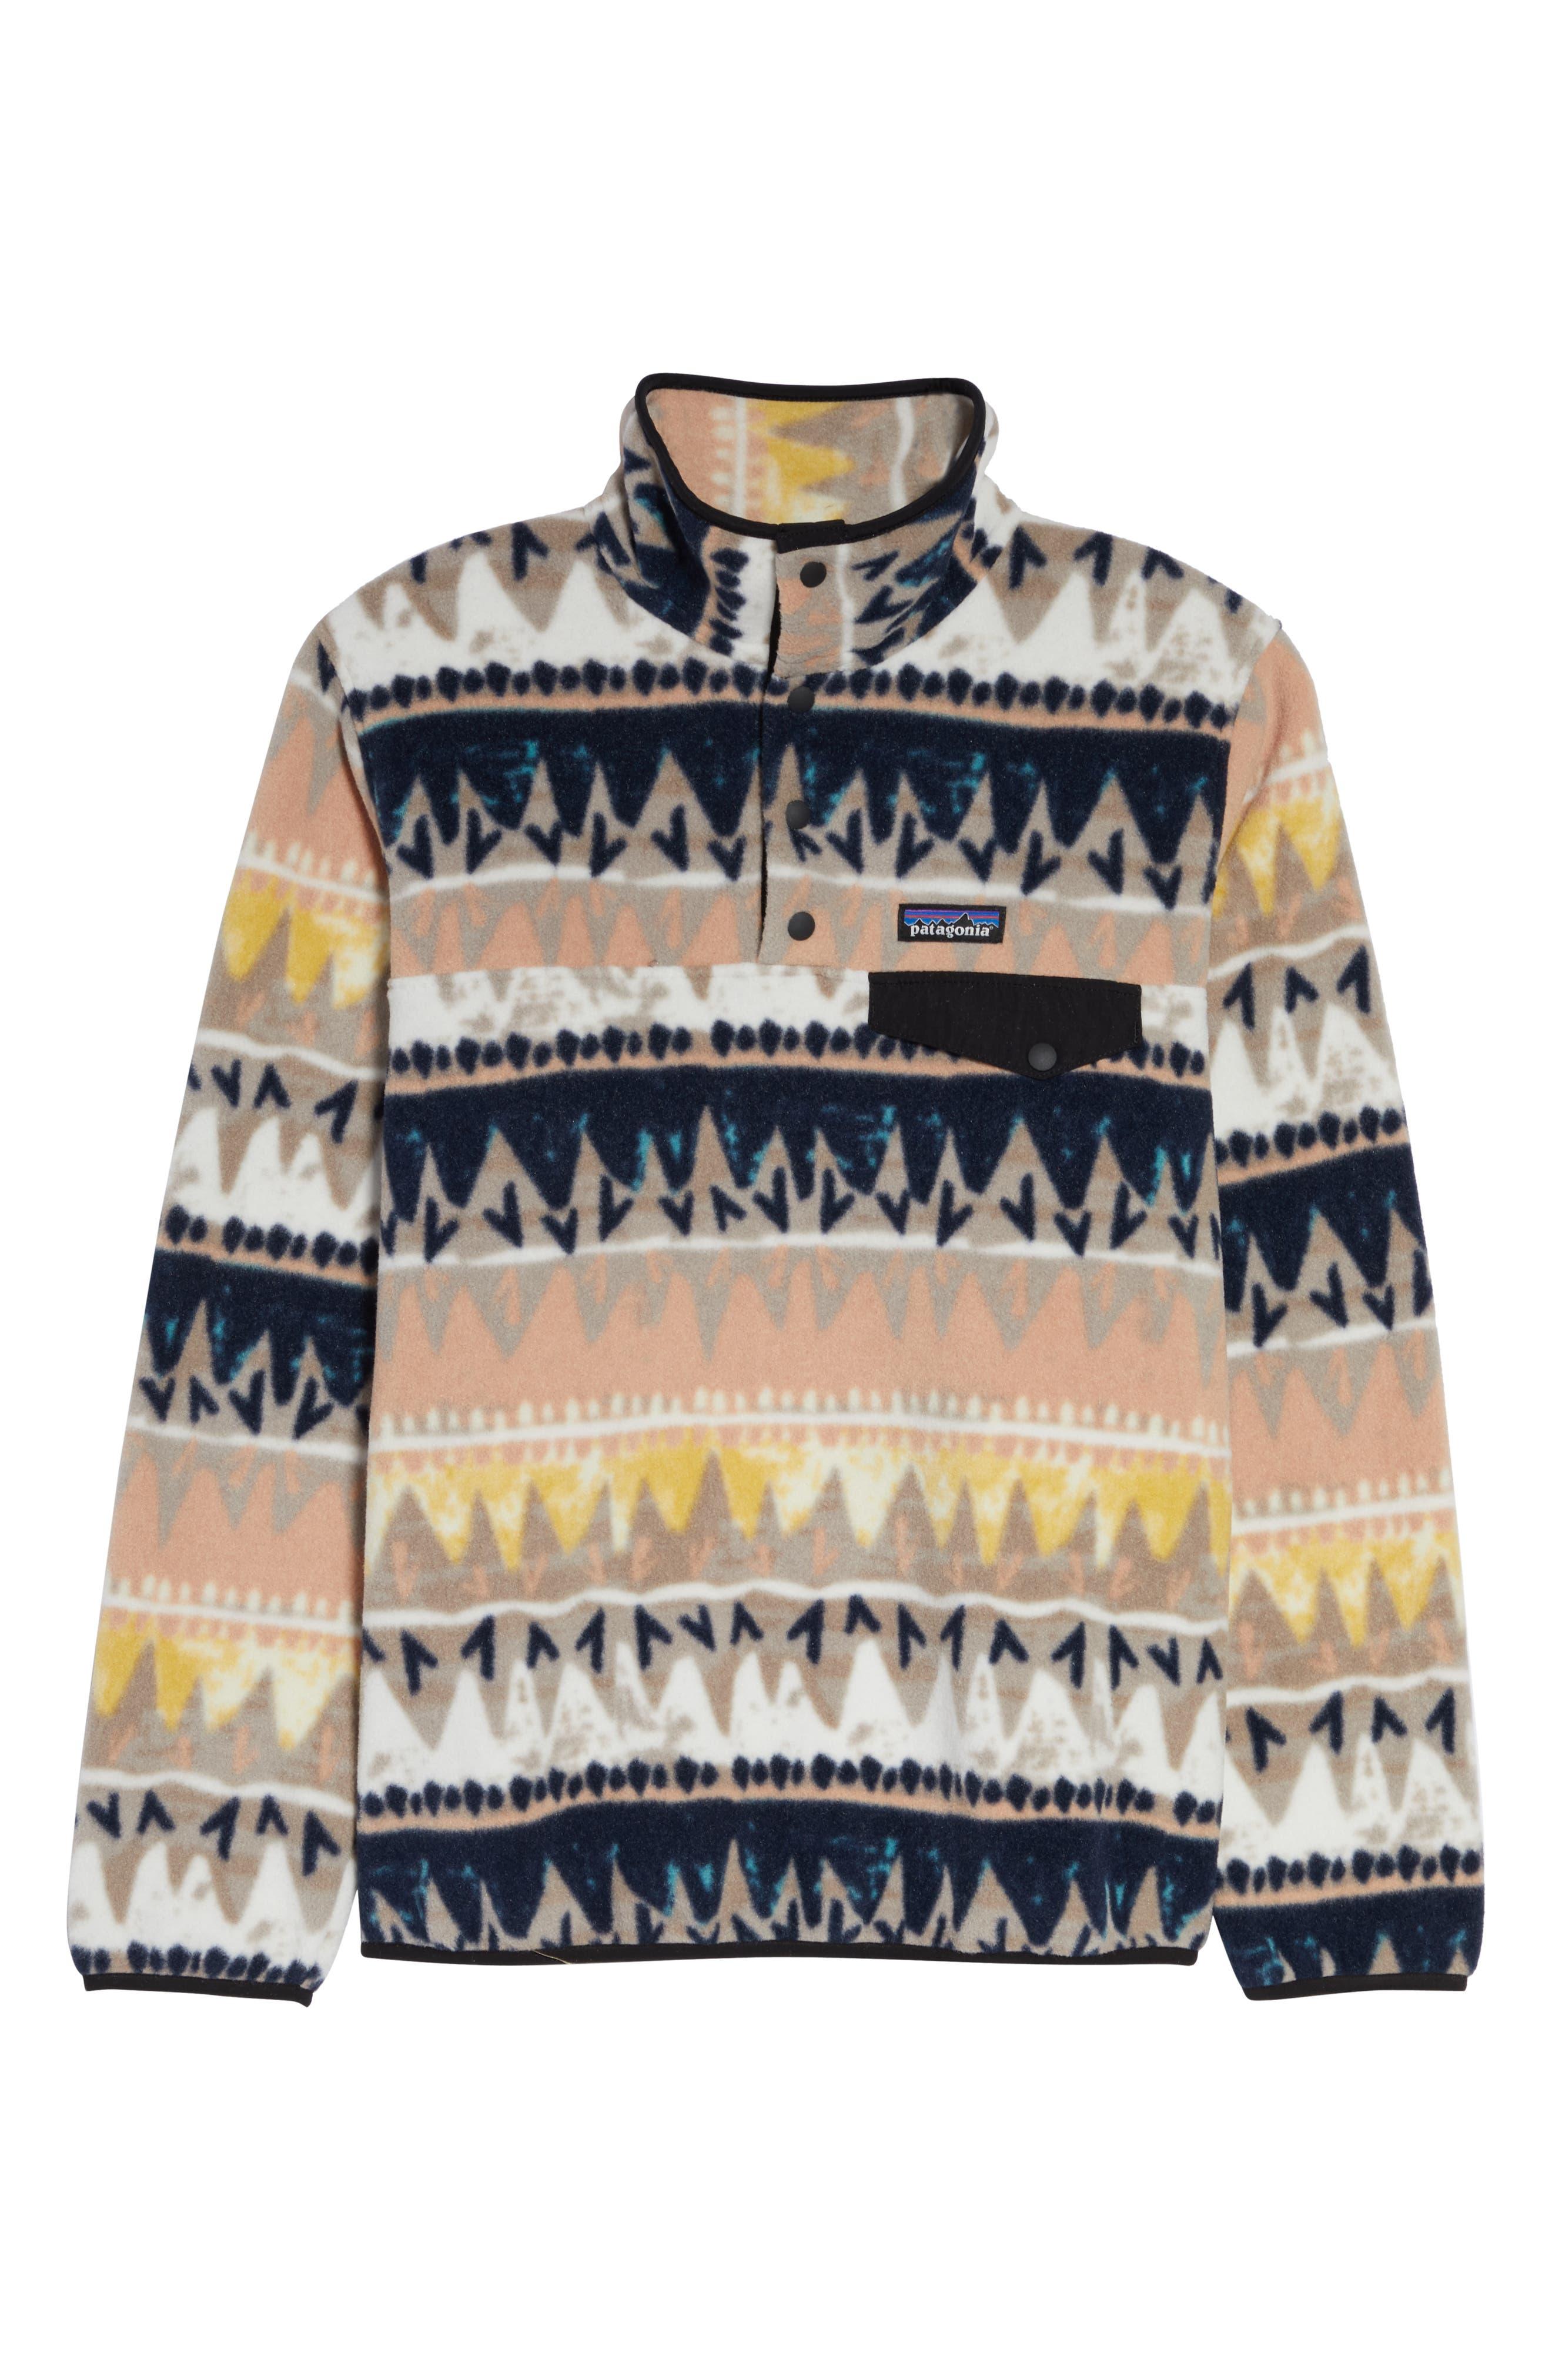 PATAGONIA, Synchilla Snap-T<sup>®</sup> Fleece Pullover, Alternate thumbnail 6, color, BANDICOOT/ MARROW GREY